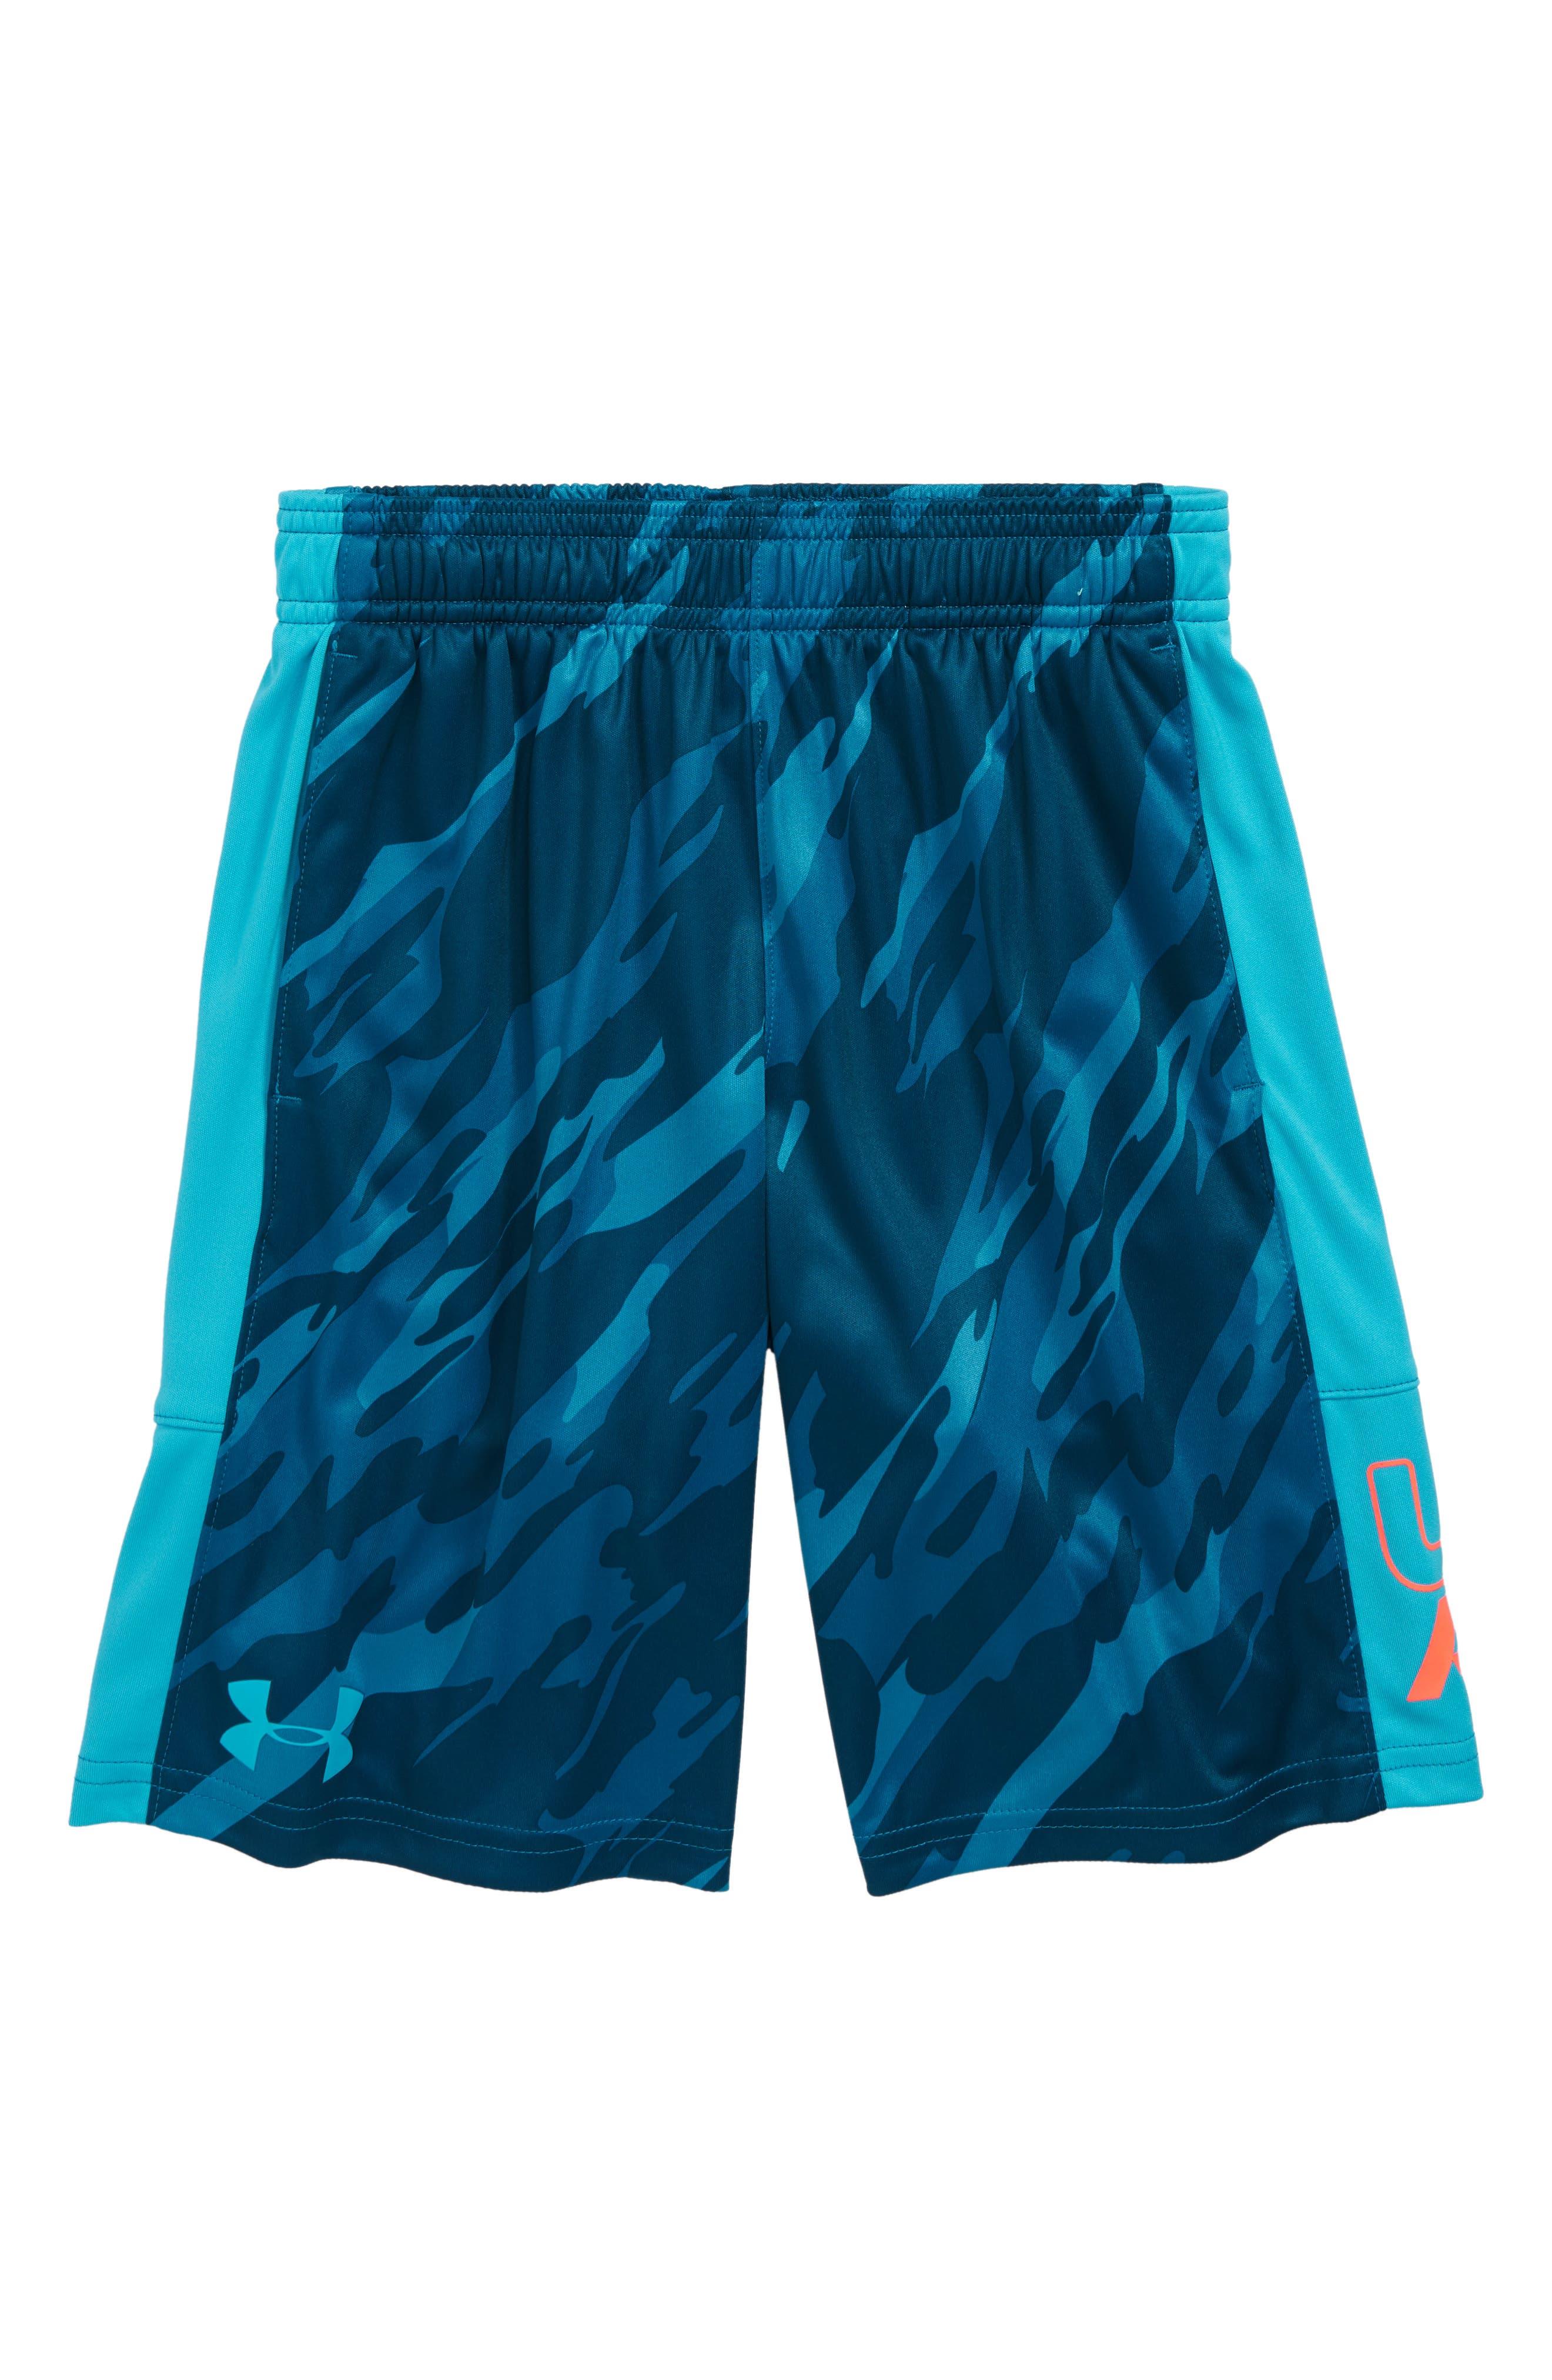 Stunt HeatGear<sup>®</sup> Shorts,                         Main,                         color, DECEIT/ TECHNO TEAL